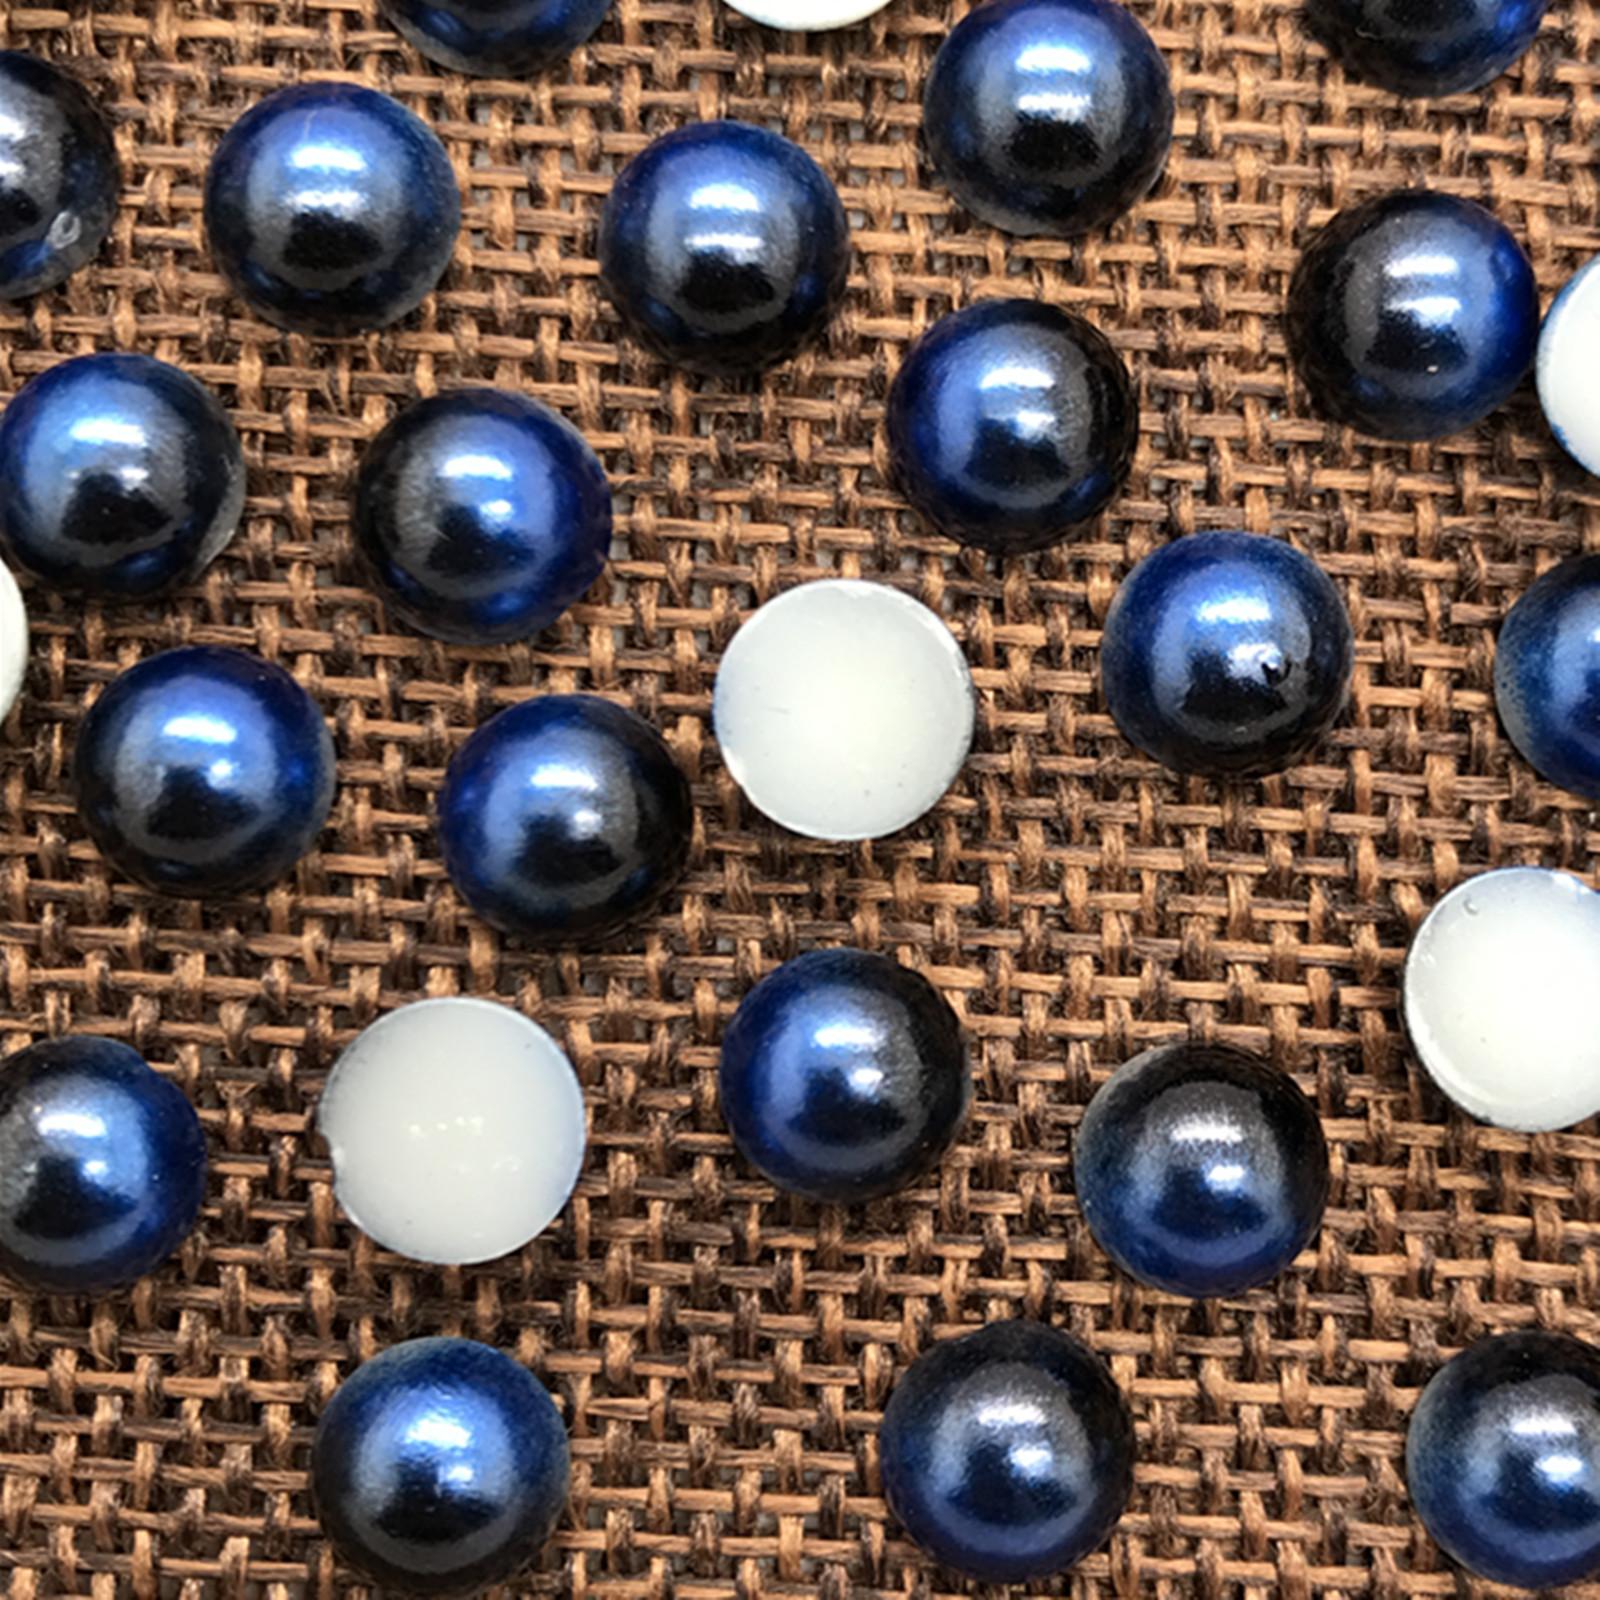 8mm 50pcs Half Round Bead Flat Back Pearl Scrapbooking Embellishment colour #09